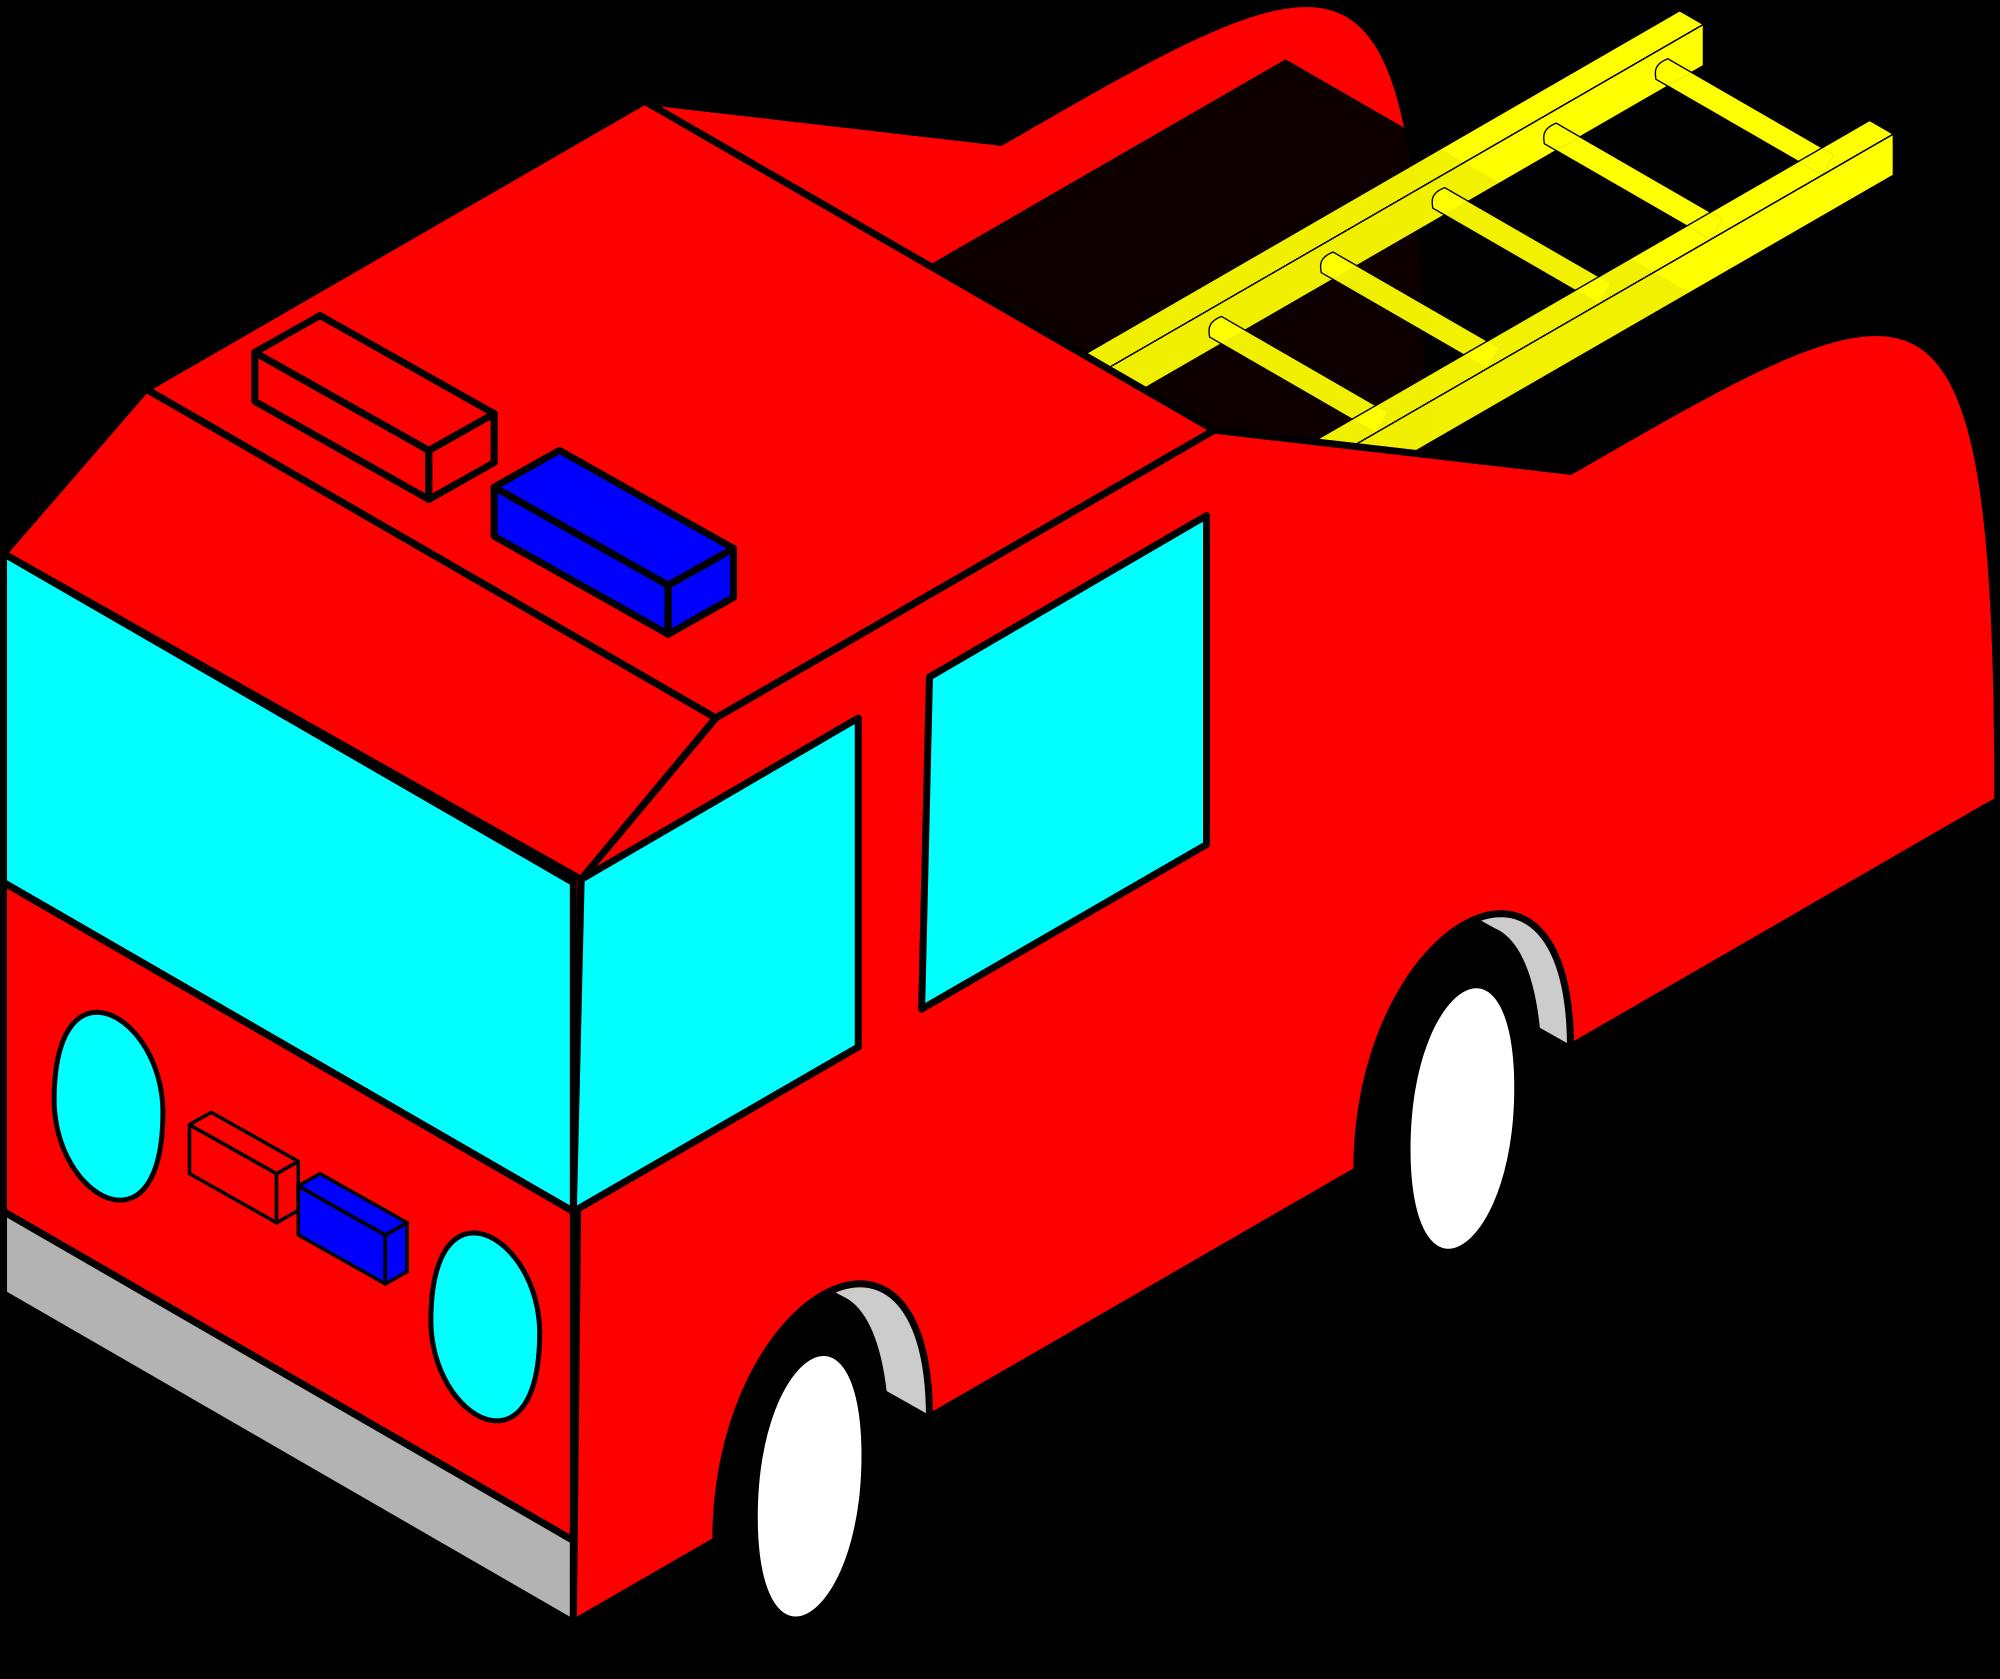 Firetruck Clipart Svg Firetruck Svg Transparent Free For Download On Webstockreview 2021